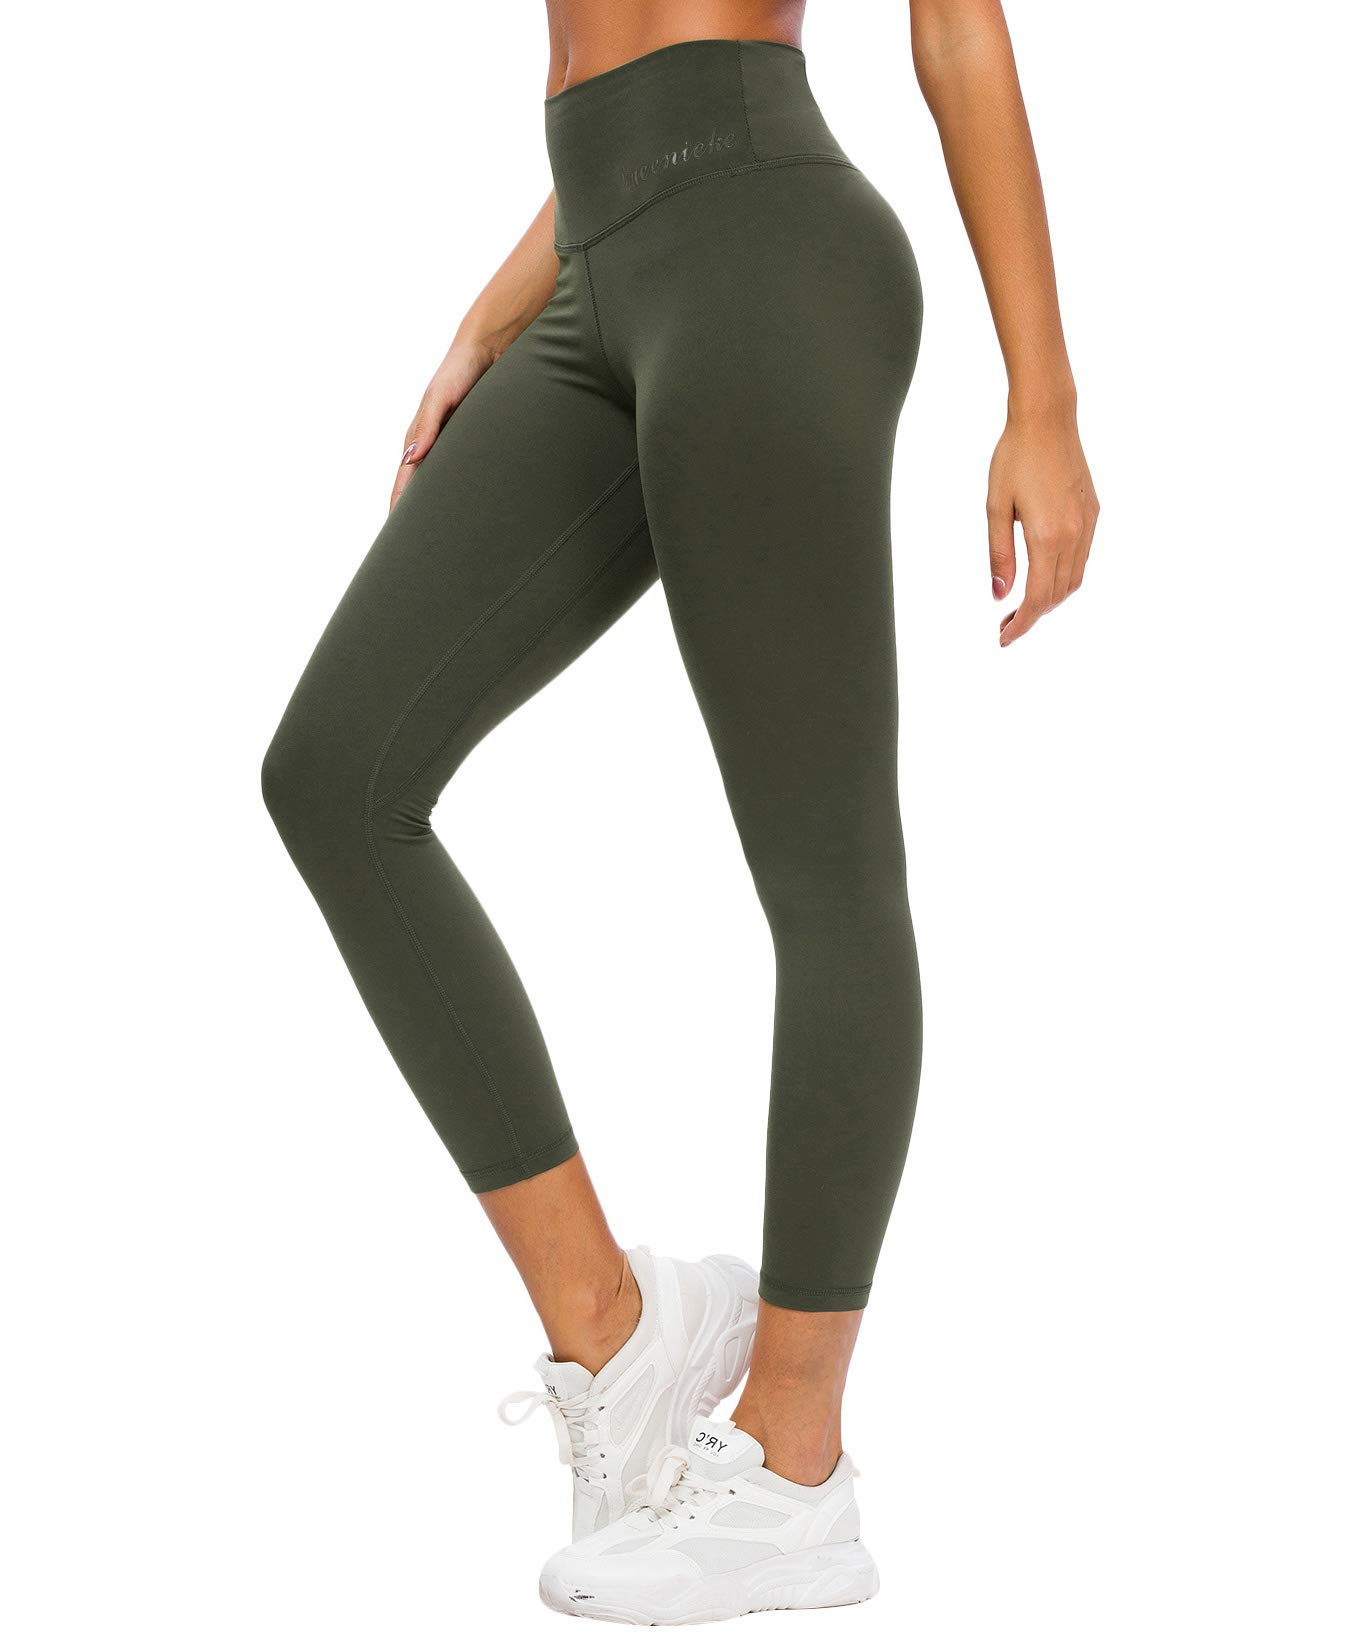 QUEENIEKE Women Yoga Leggings High Waisted Buttery-Soft 7/8 Length Pants 90826